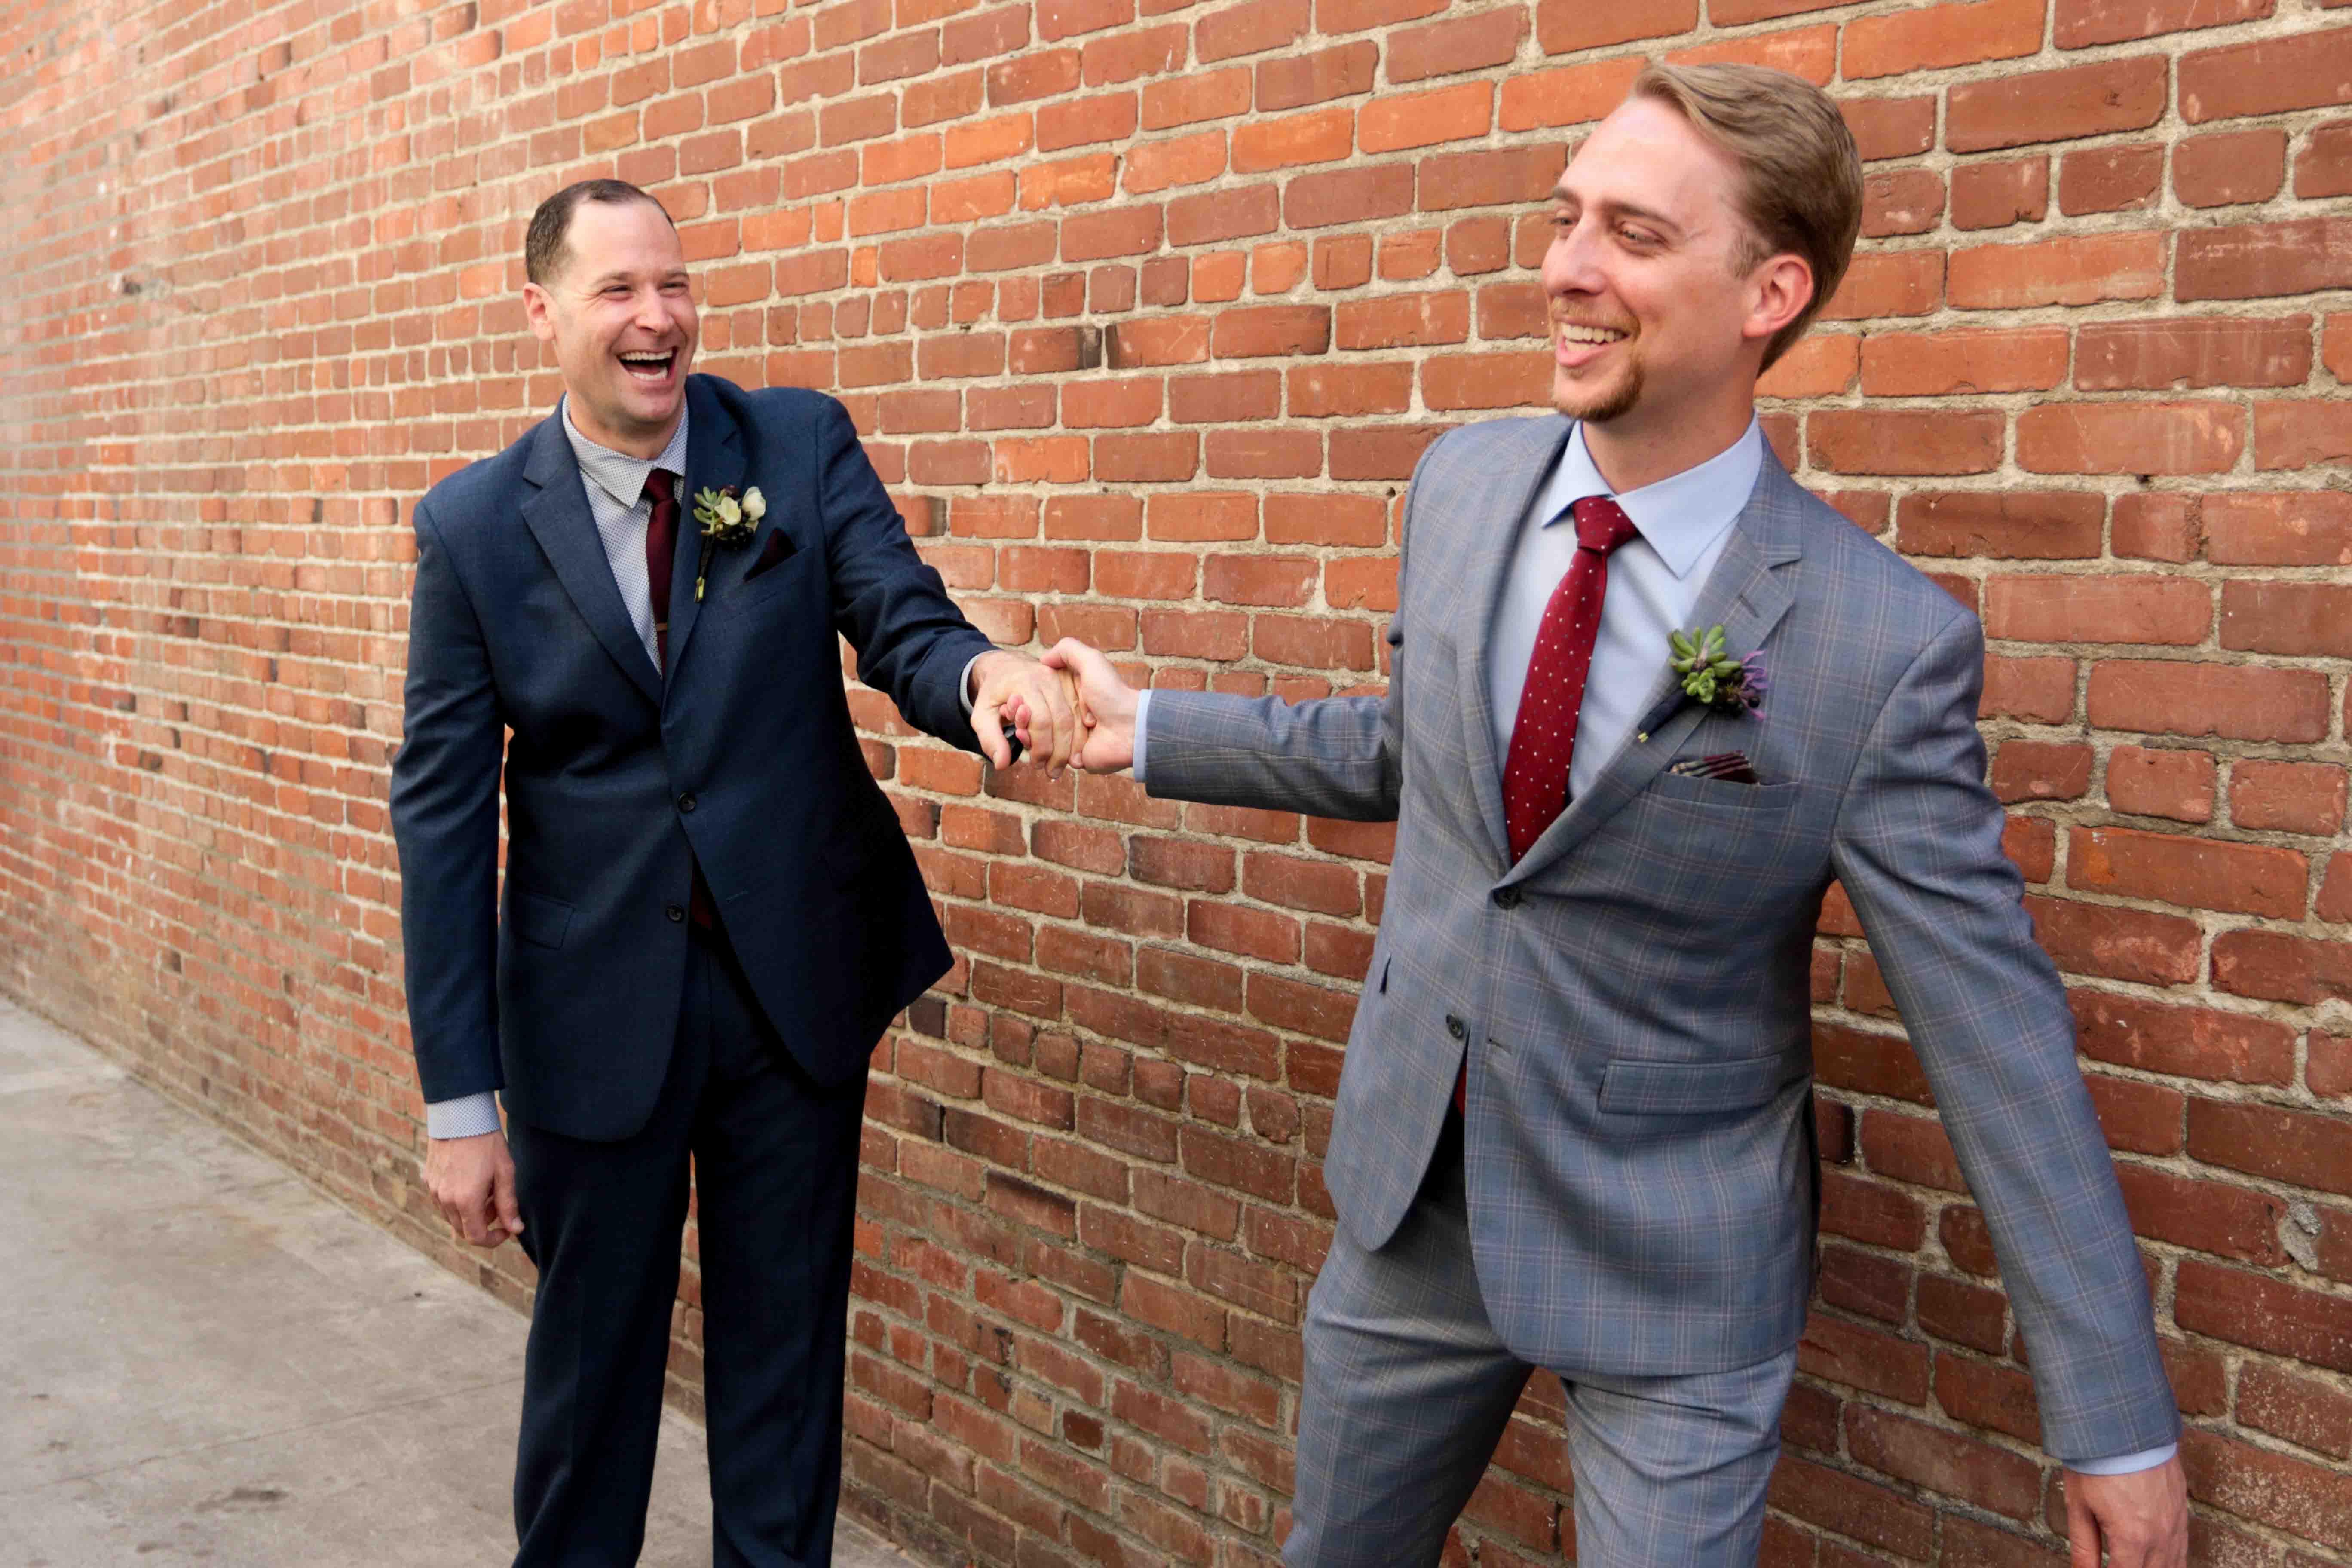 Long Beach Wedding Photography, Gay Wedding Photography